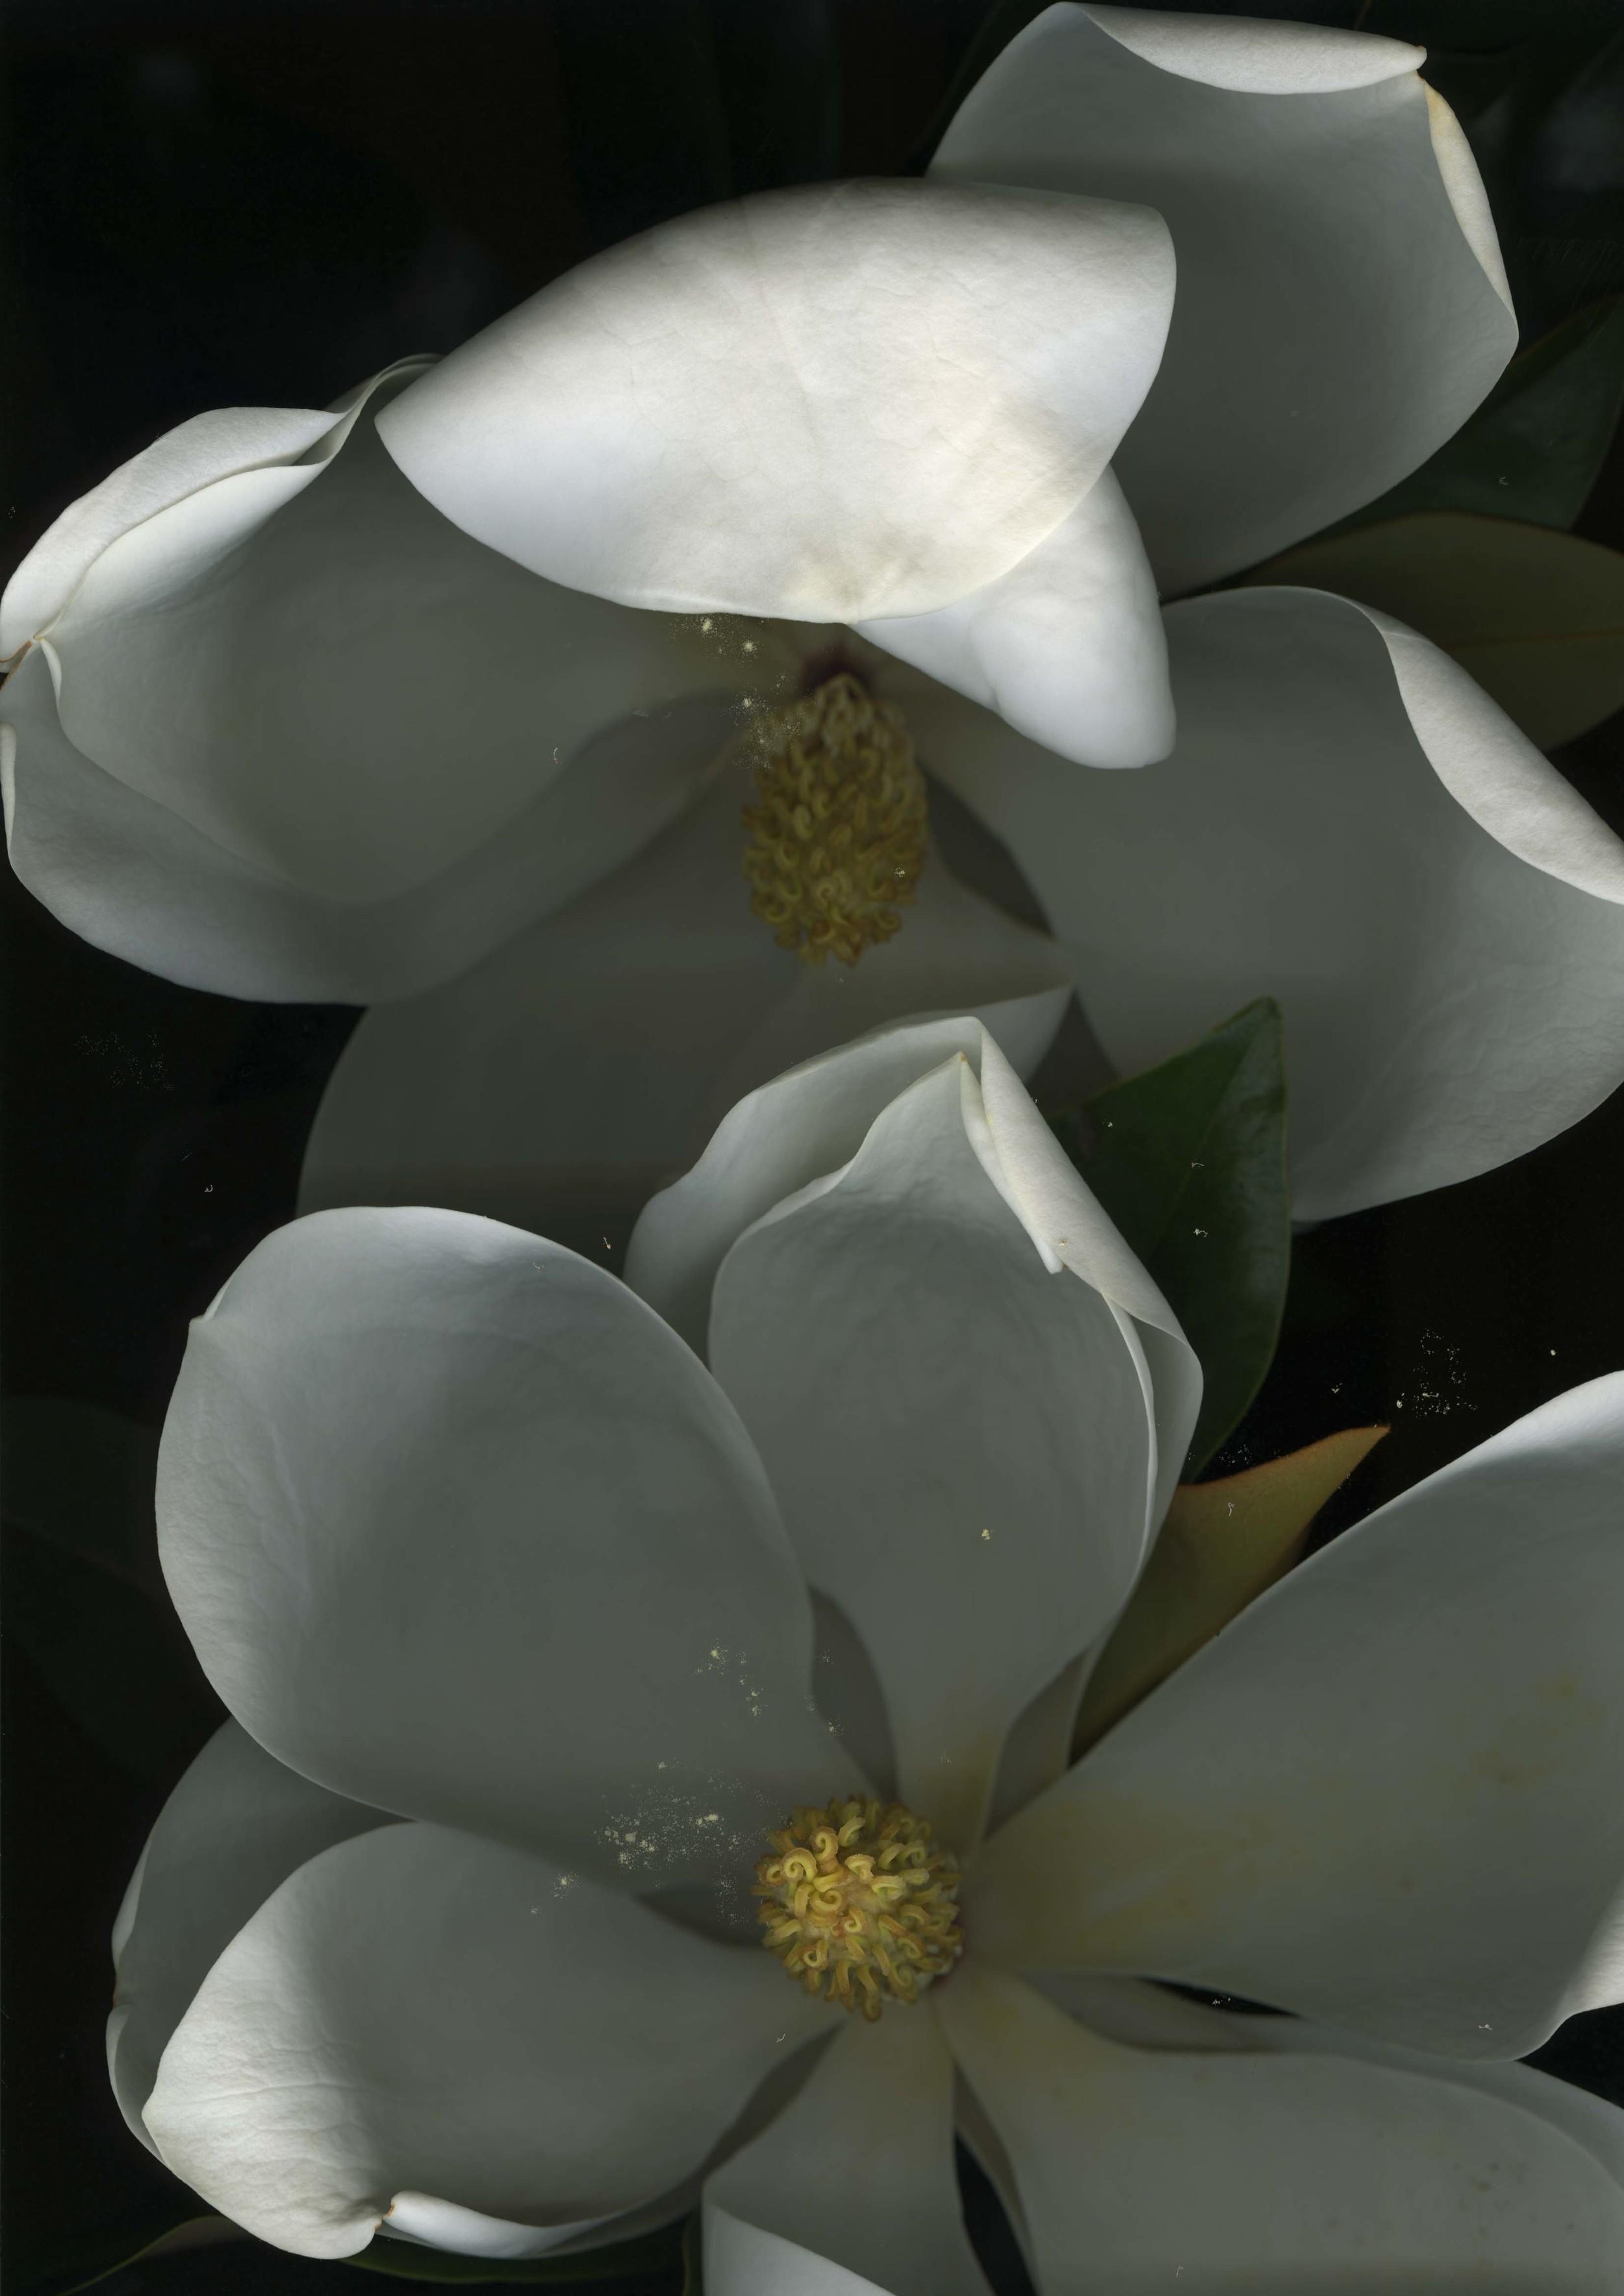 magnolia_2.jpg